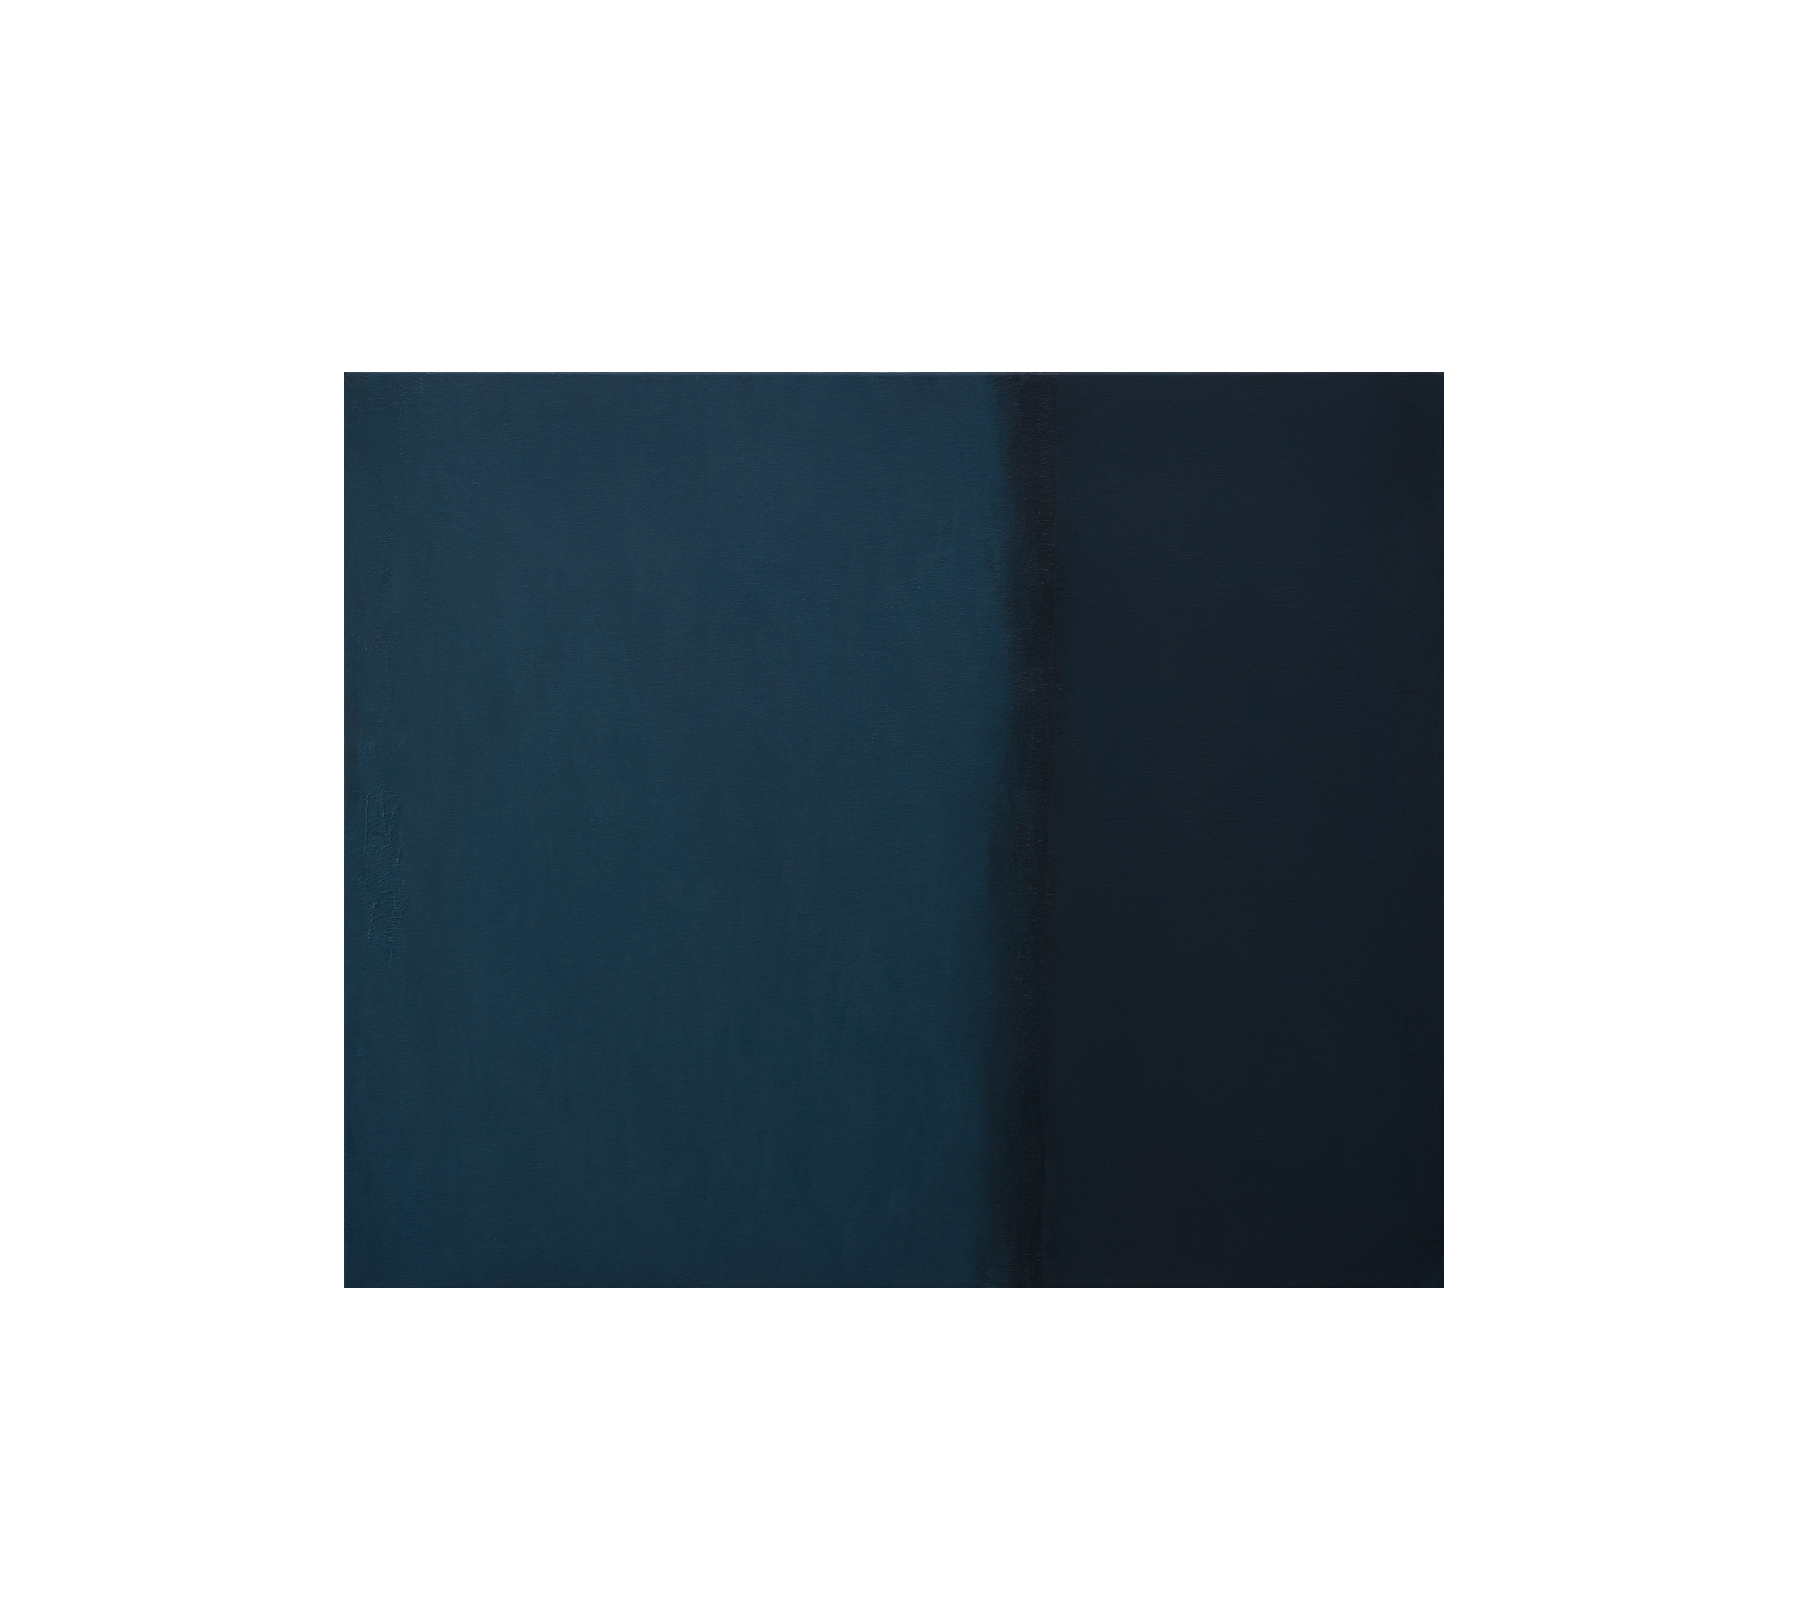 Untitled 2019 100x120cm